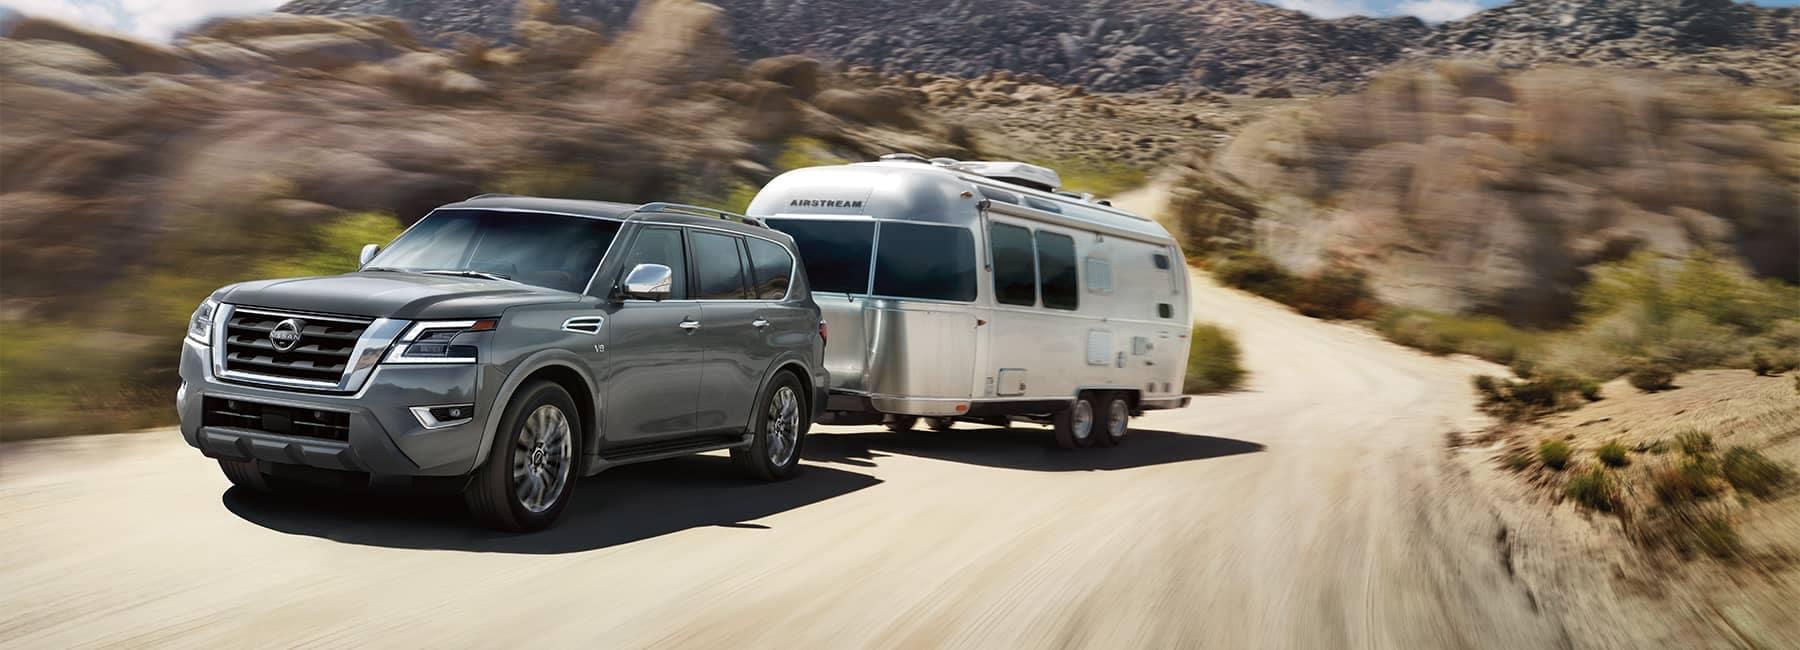 A 2021 Grey Nissan Armada hauling an Airstreem camper_mobile